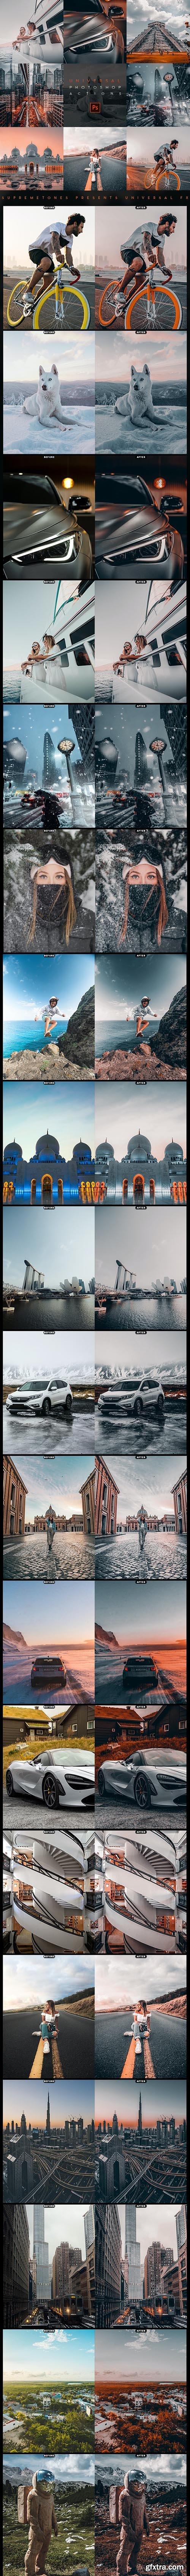 GraphicRiver - UNIVERSAL Photoshop Actions 28301543